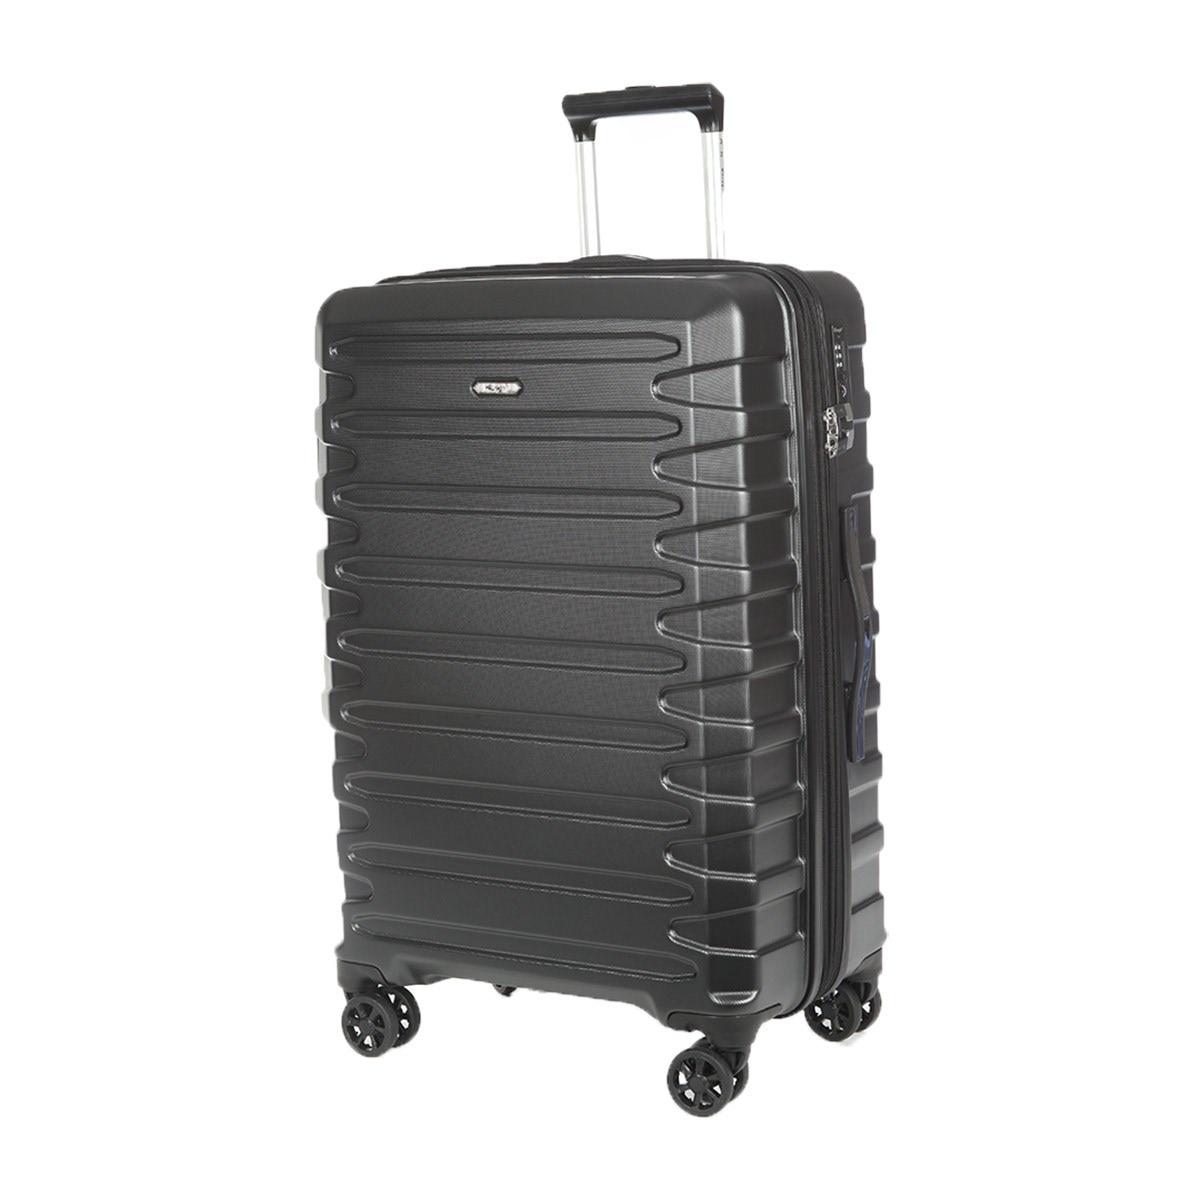 Suitcase-trolley Verage GM17106W25 black